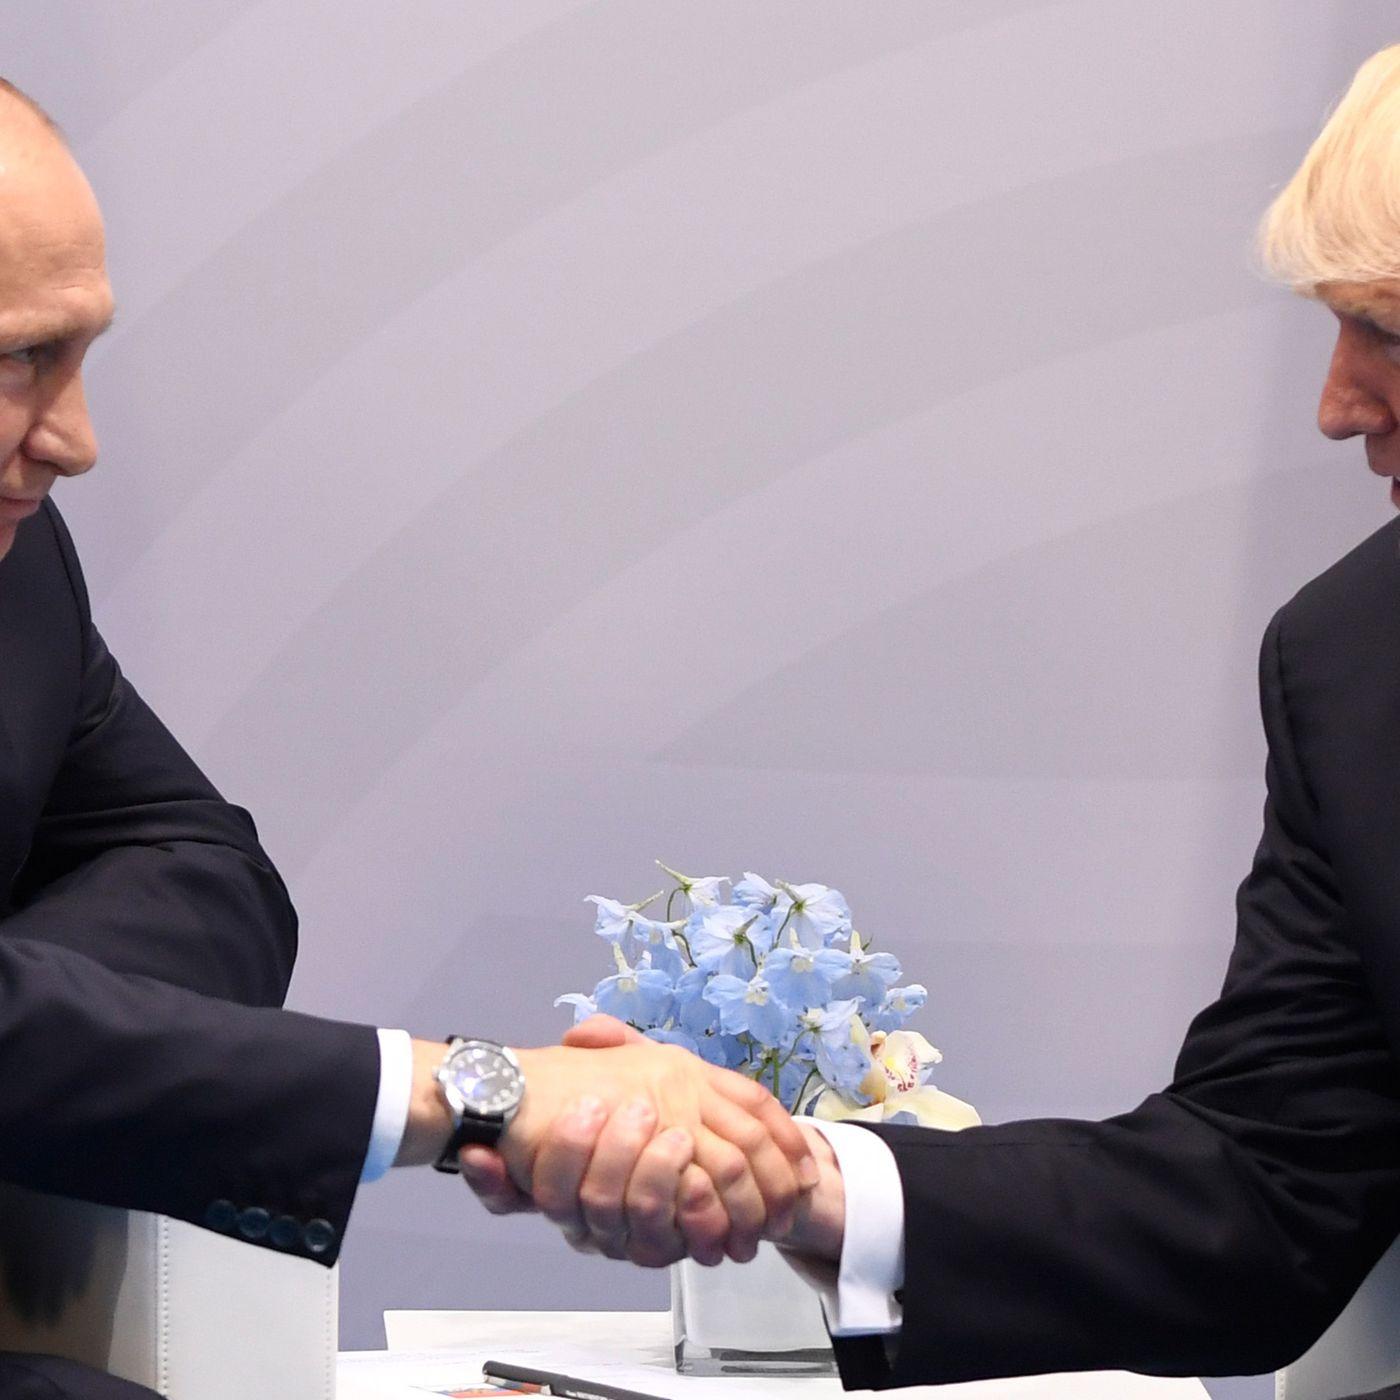 Trump passed his first test: the handshake with Putin - Vox